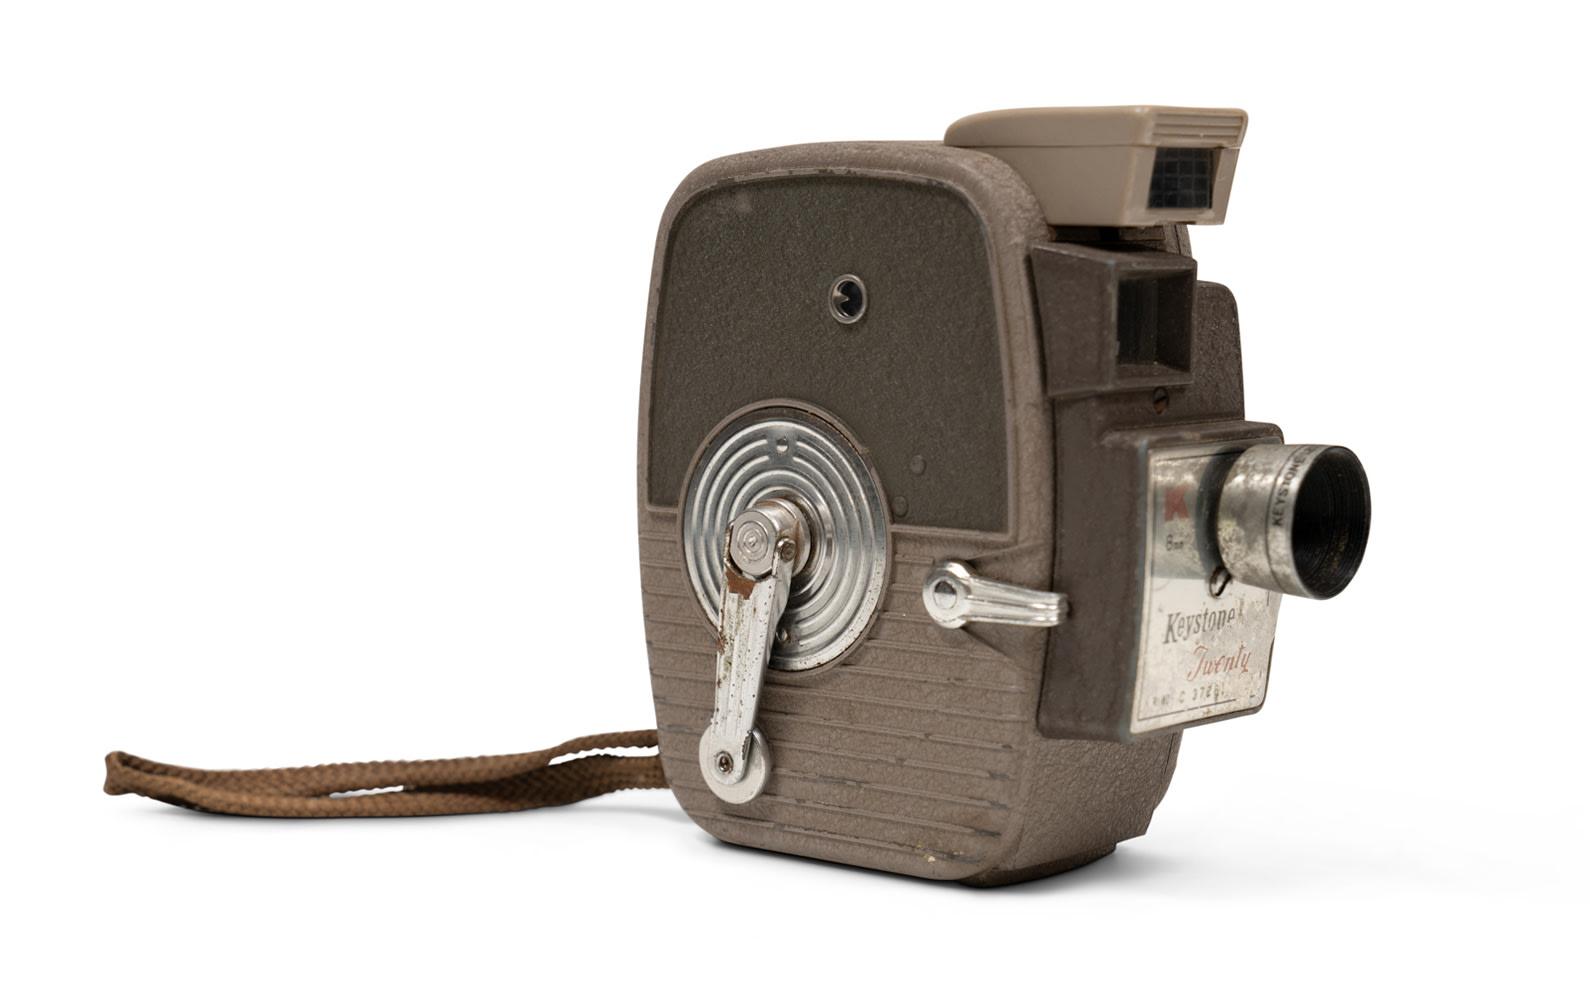 Prod/O21E - Phil Hill C 2021/C0005_Keystone Twenty 8mm Film Camera/C0005_Keystone_Twenty_8mm_Film_Camera_1_azqjml